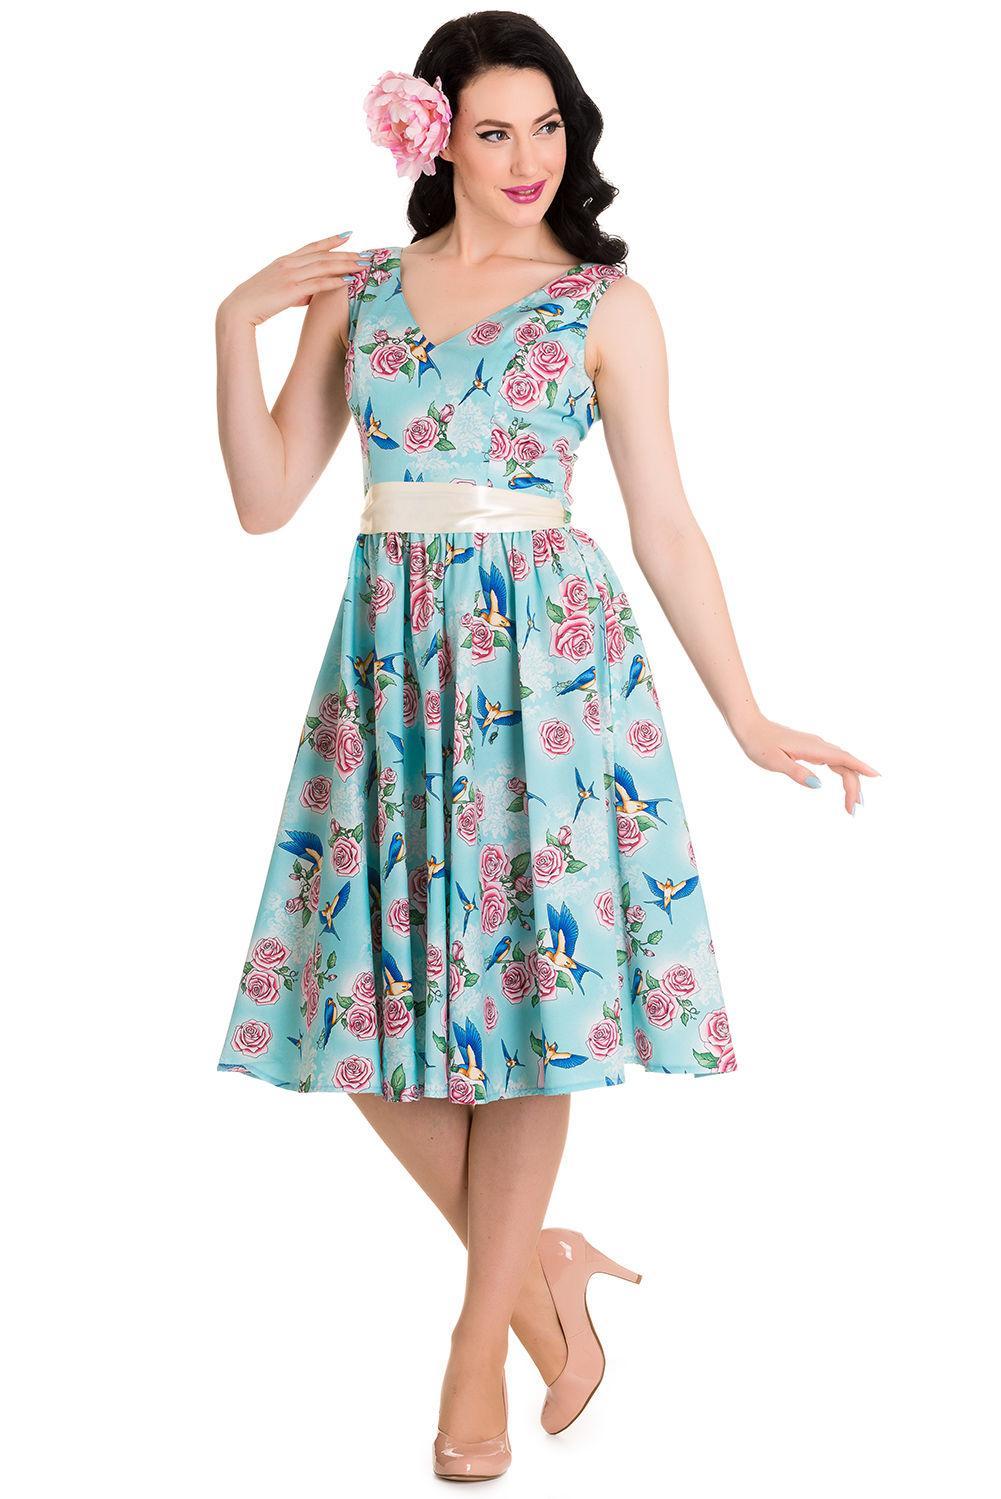 66c31d45790f Køb Blå kjole med blomster og fugle - Price  499